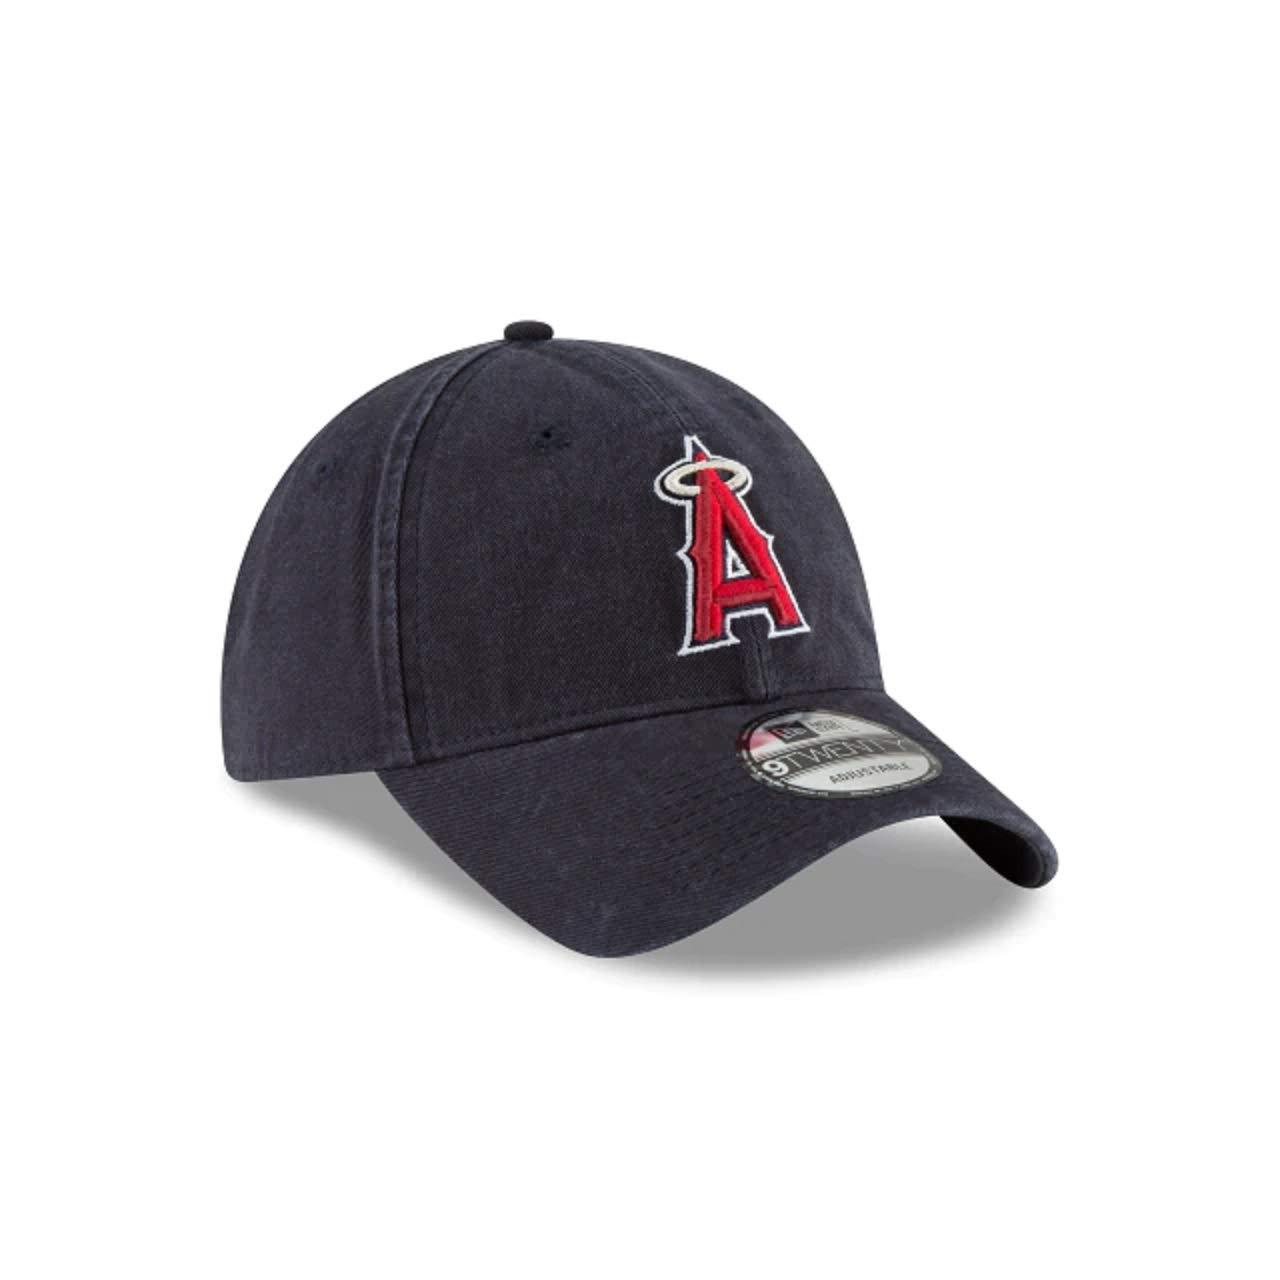 461bfcf038b Amazon.com  New Era Core Classic 9TWENTY Adjustable Hat (Anaheim Angels  (Navy))  Clothing